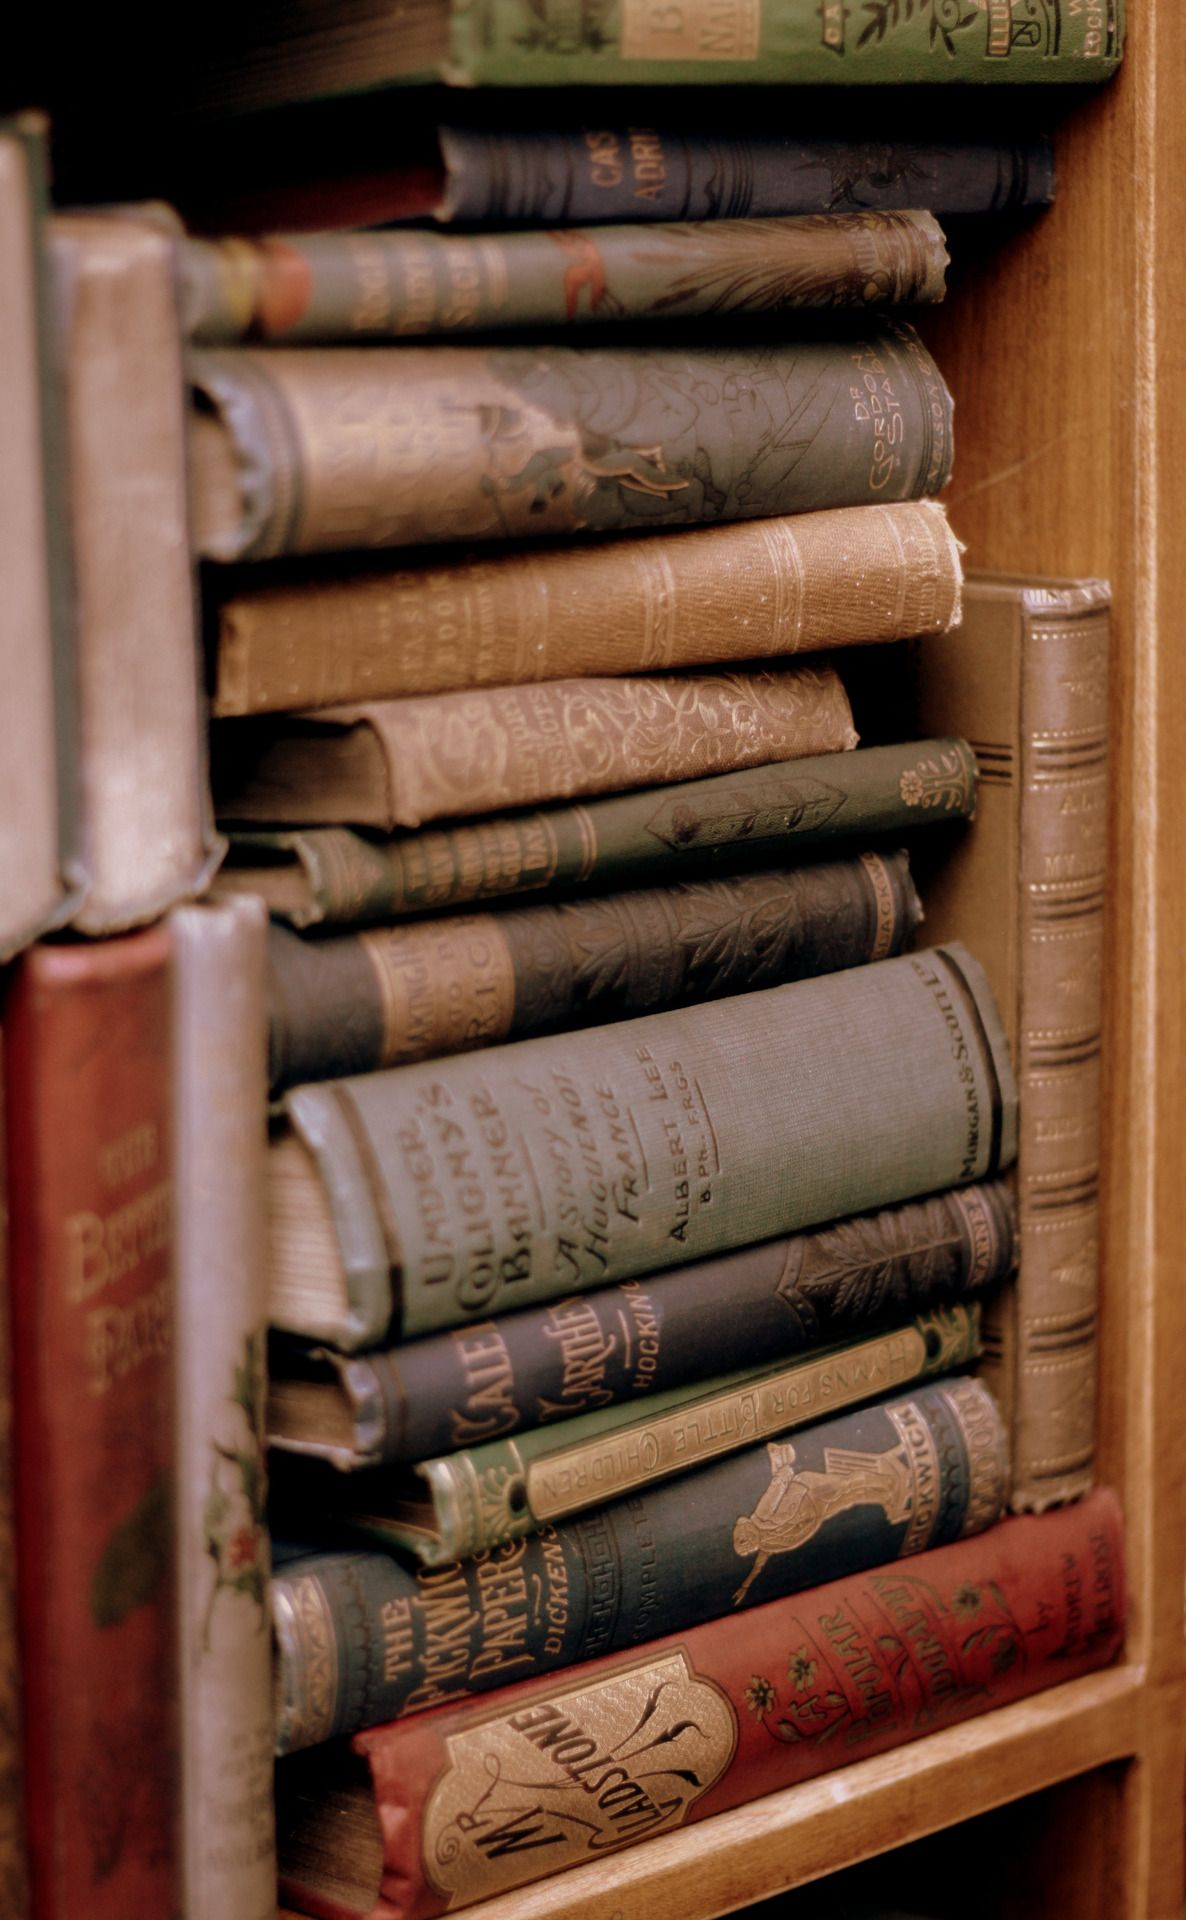 Old Books Things Michaelmoonsbookshop Old Books Libro Antico Libri Antichi Mappe D Epoca